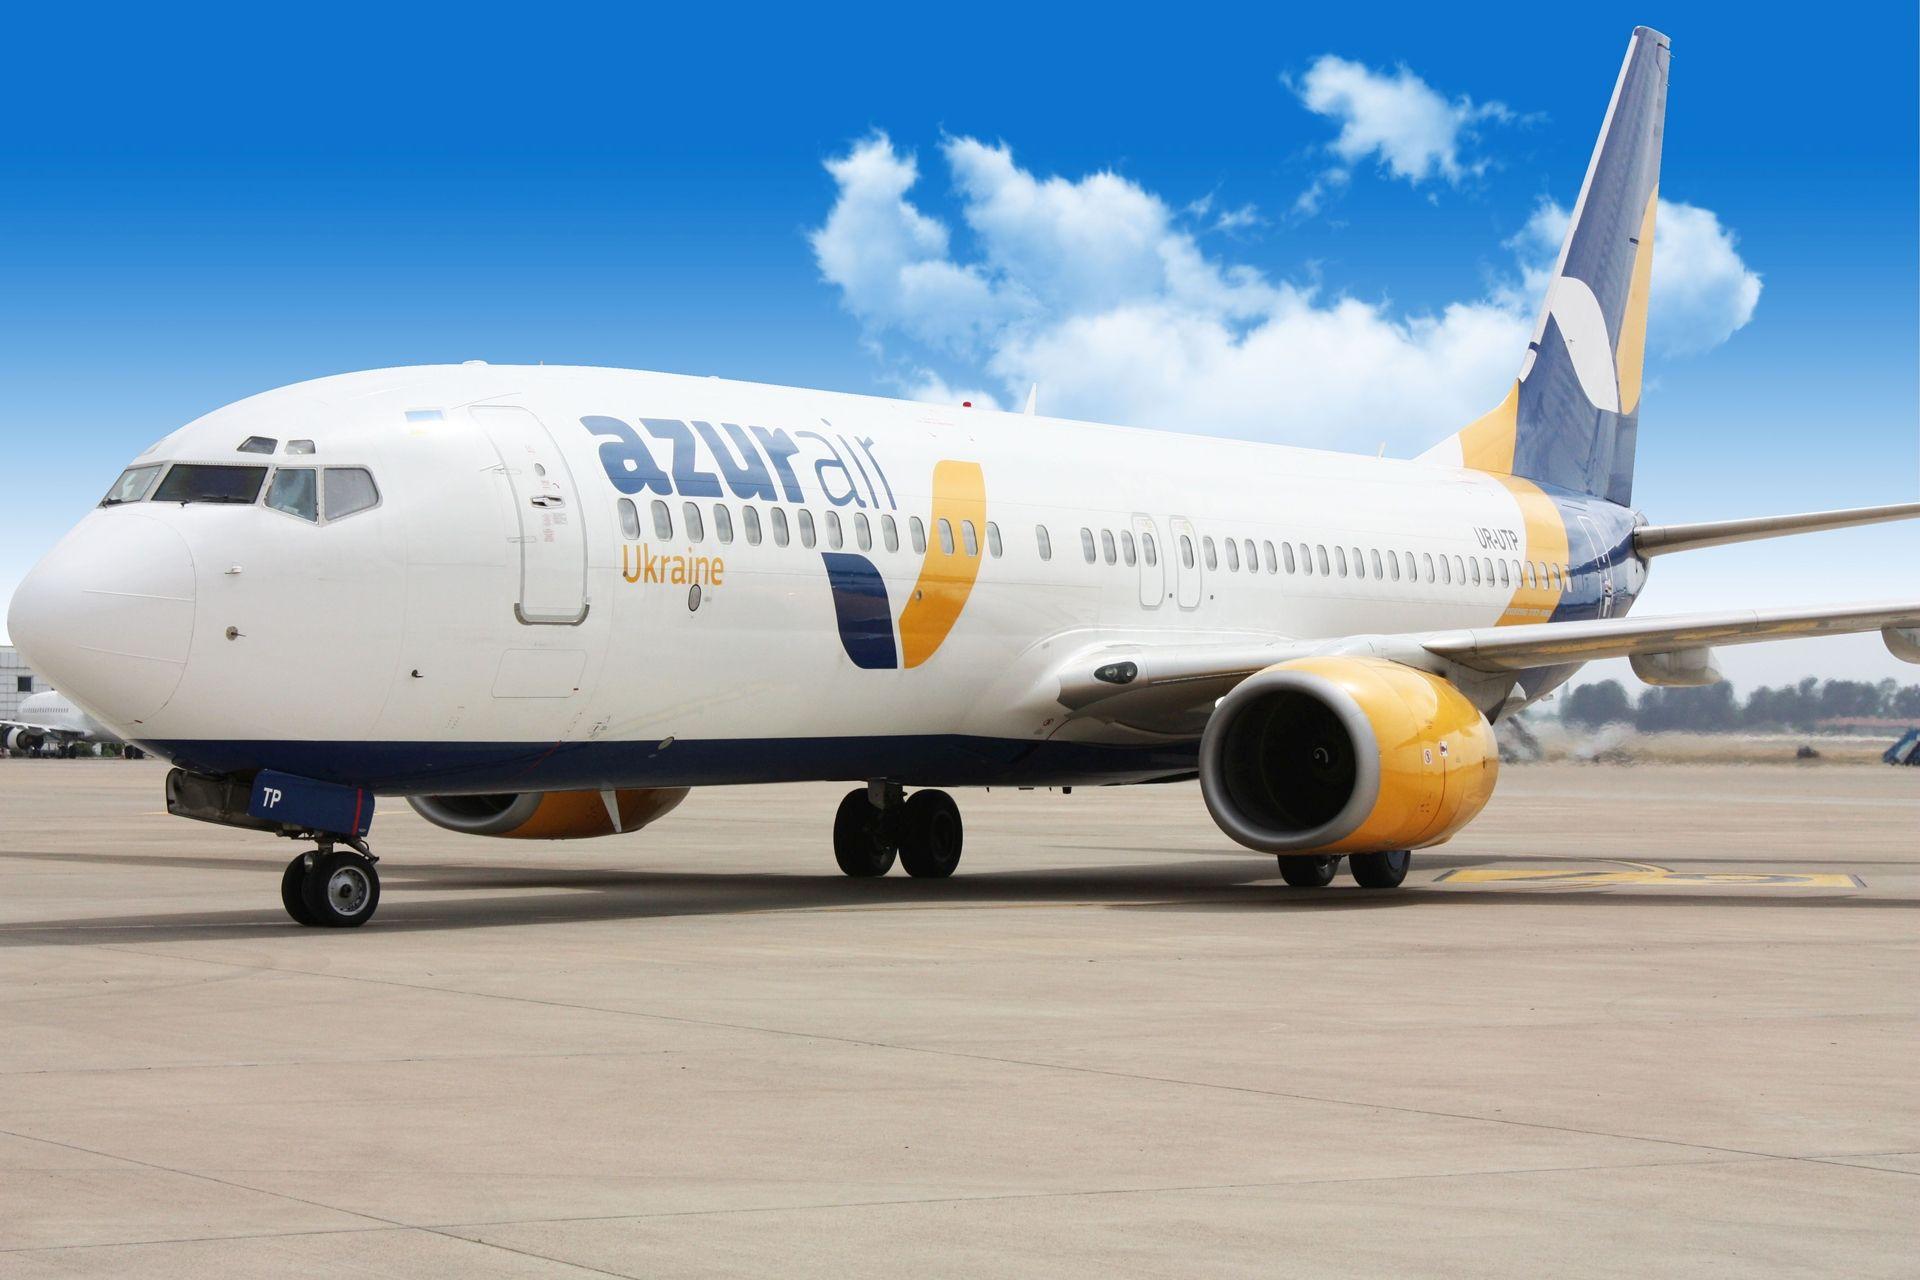 Azur Ukraine recibe autorización para volver a La Romana. 1ra vez que opera en verano en este destino